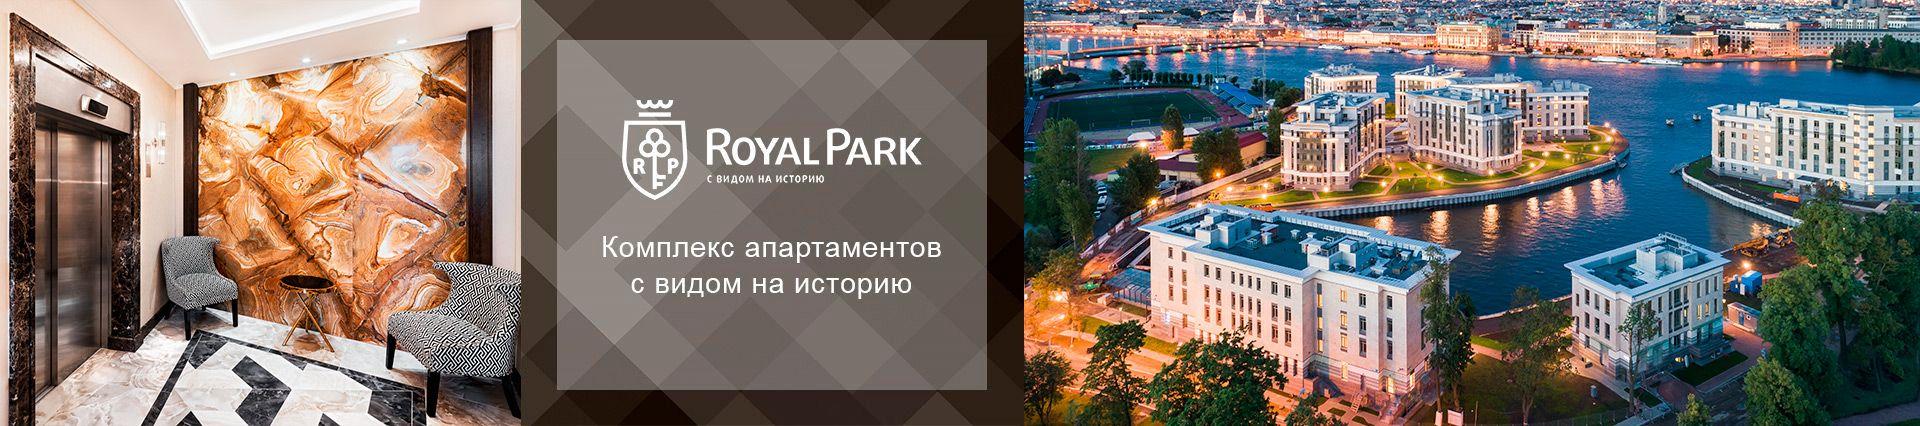 https://evspb.ru/wp-content/uploads/2018/09/royal-Park-2.jpg